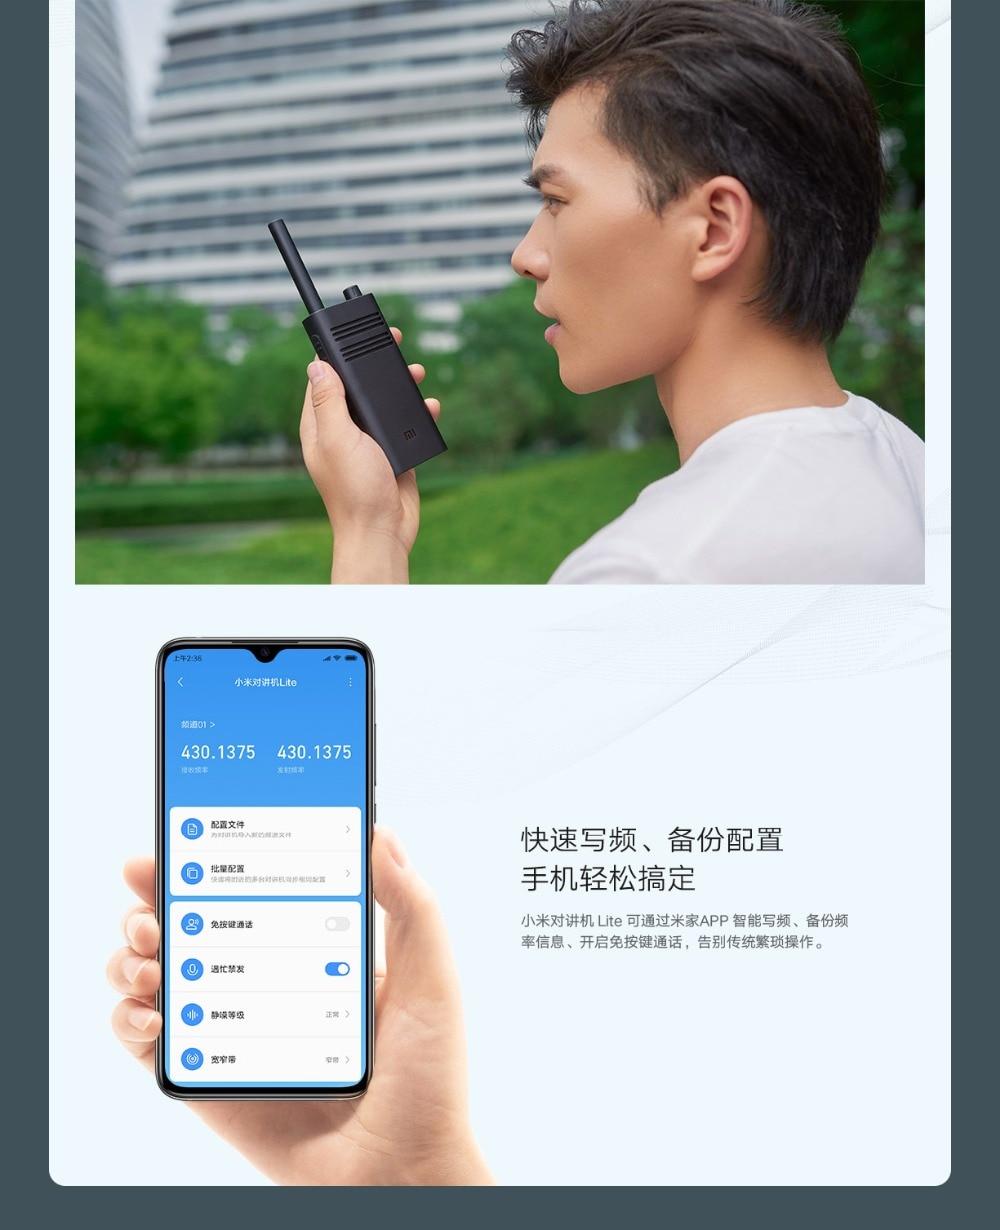 2020 New Xiaomi Mijia Walkie Talkie Lite Civil 5 Km Intercom Outdoor Handheld Mini Radio Talkie Walkie Work with mi home app (3)